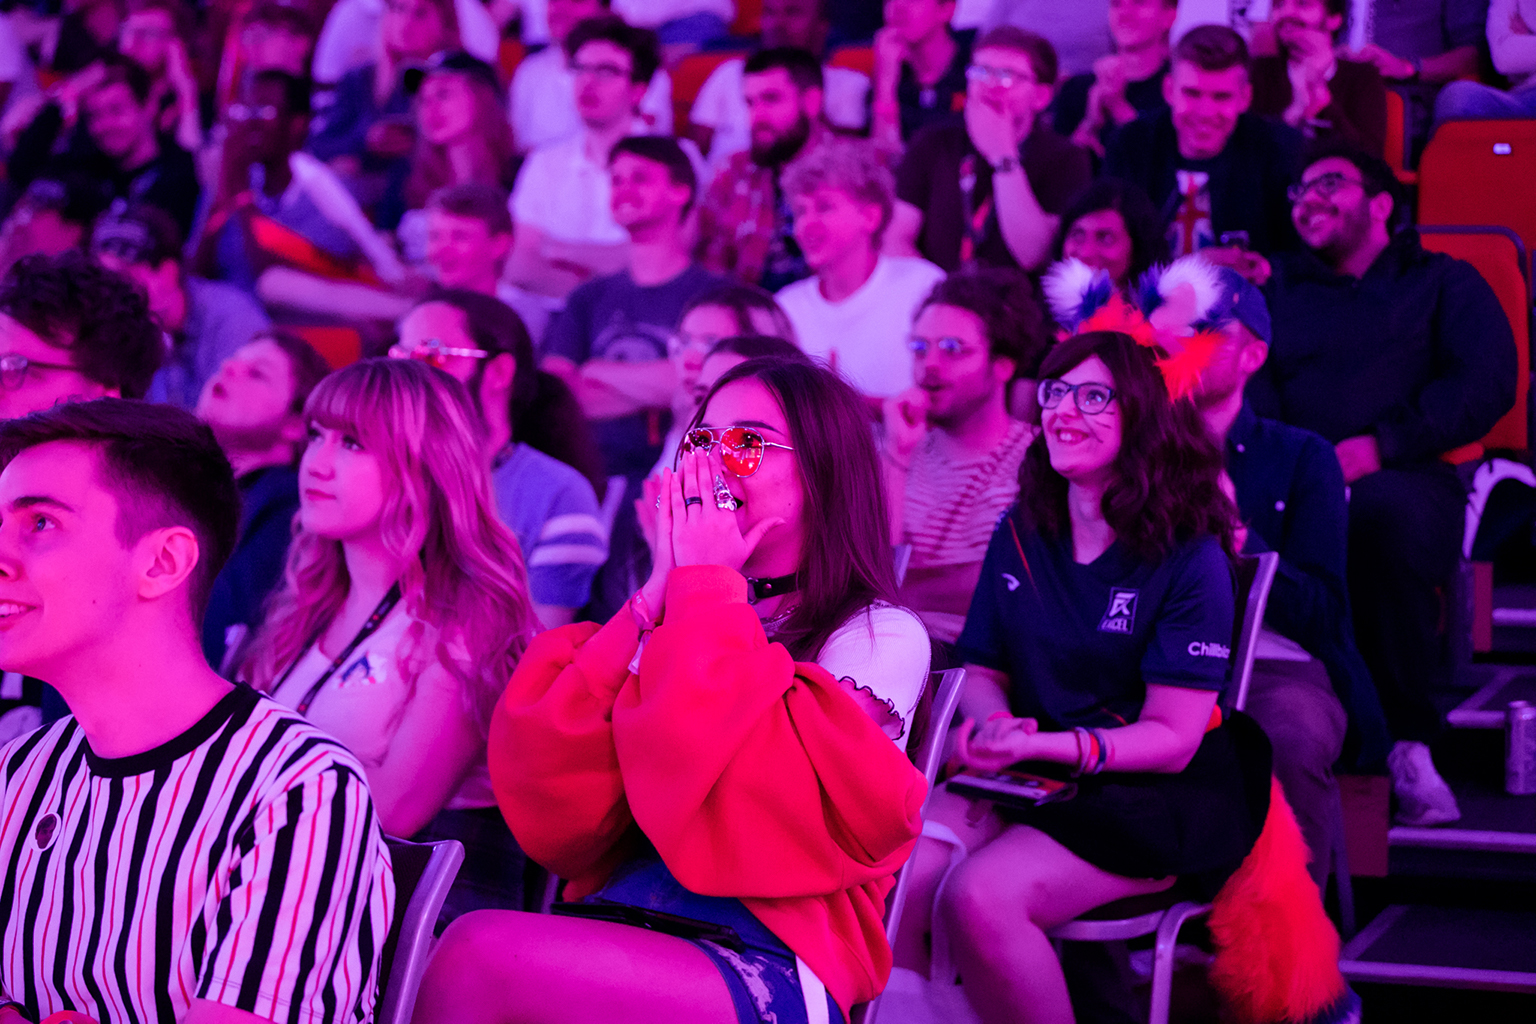 Fans at last year's UKLC Summer Finals. Photo credit: Joe Brady/LVP